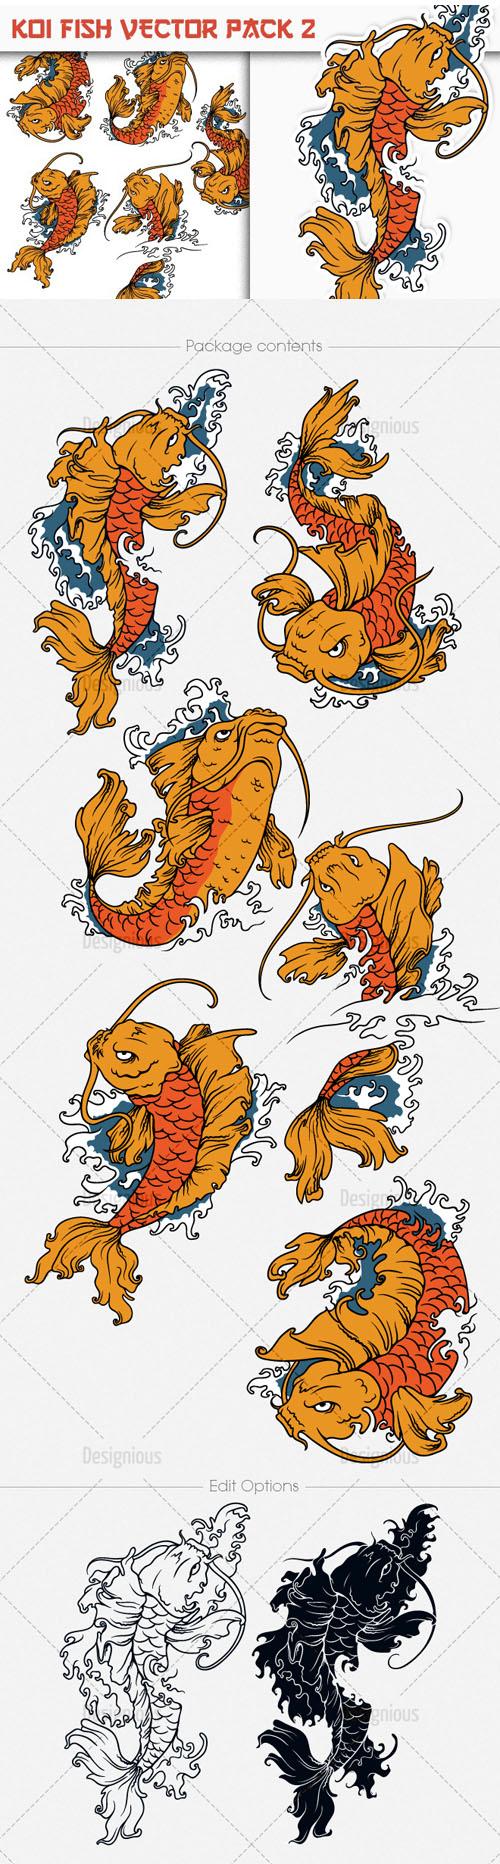 Shirt design vector pack - Koi Fish Photoshop Vector Pack 2